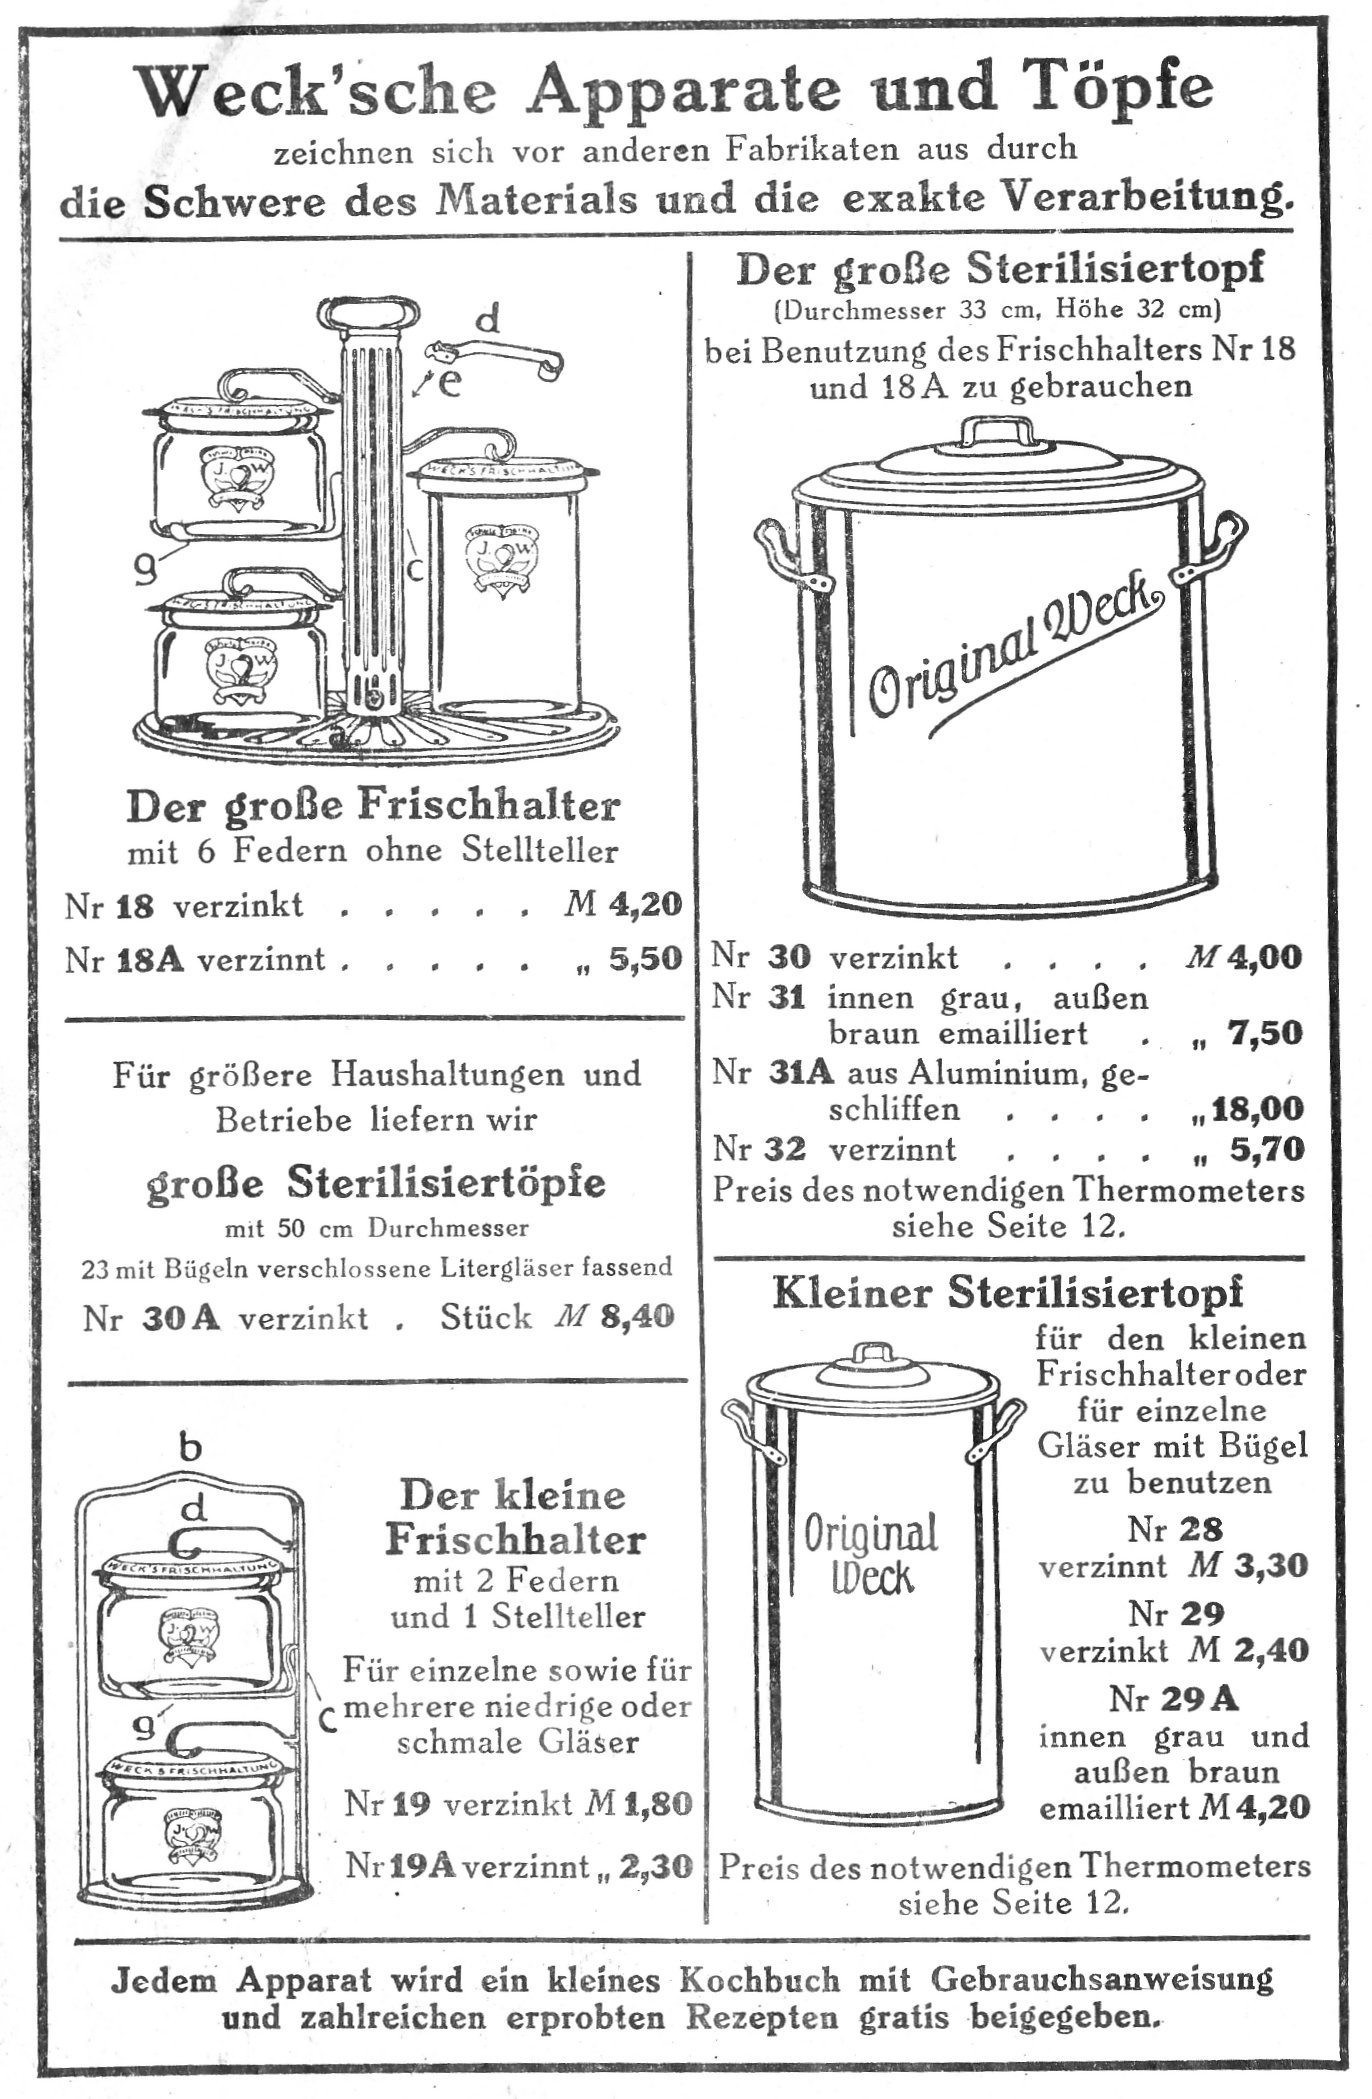 https://upload.wikimedia.org/wikipedia/commons/a/ad/Einkochtopf_1913.jpg